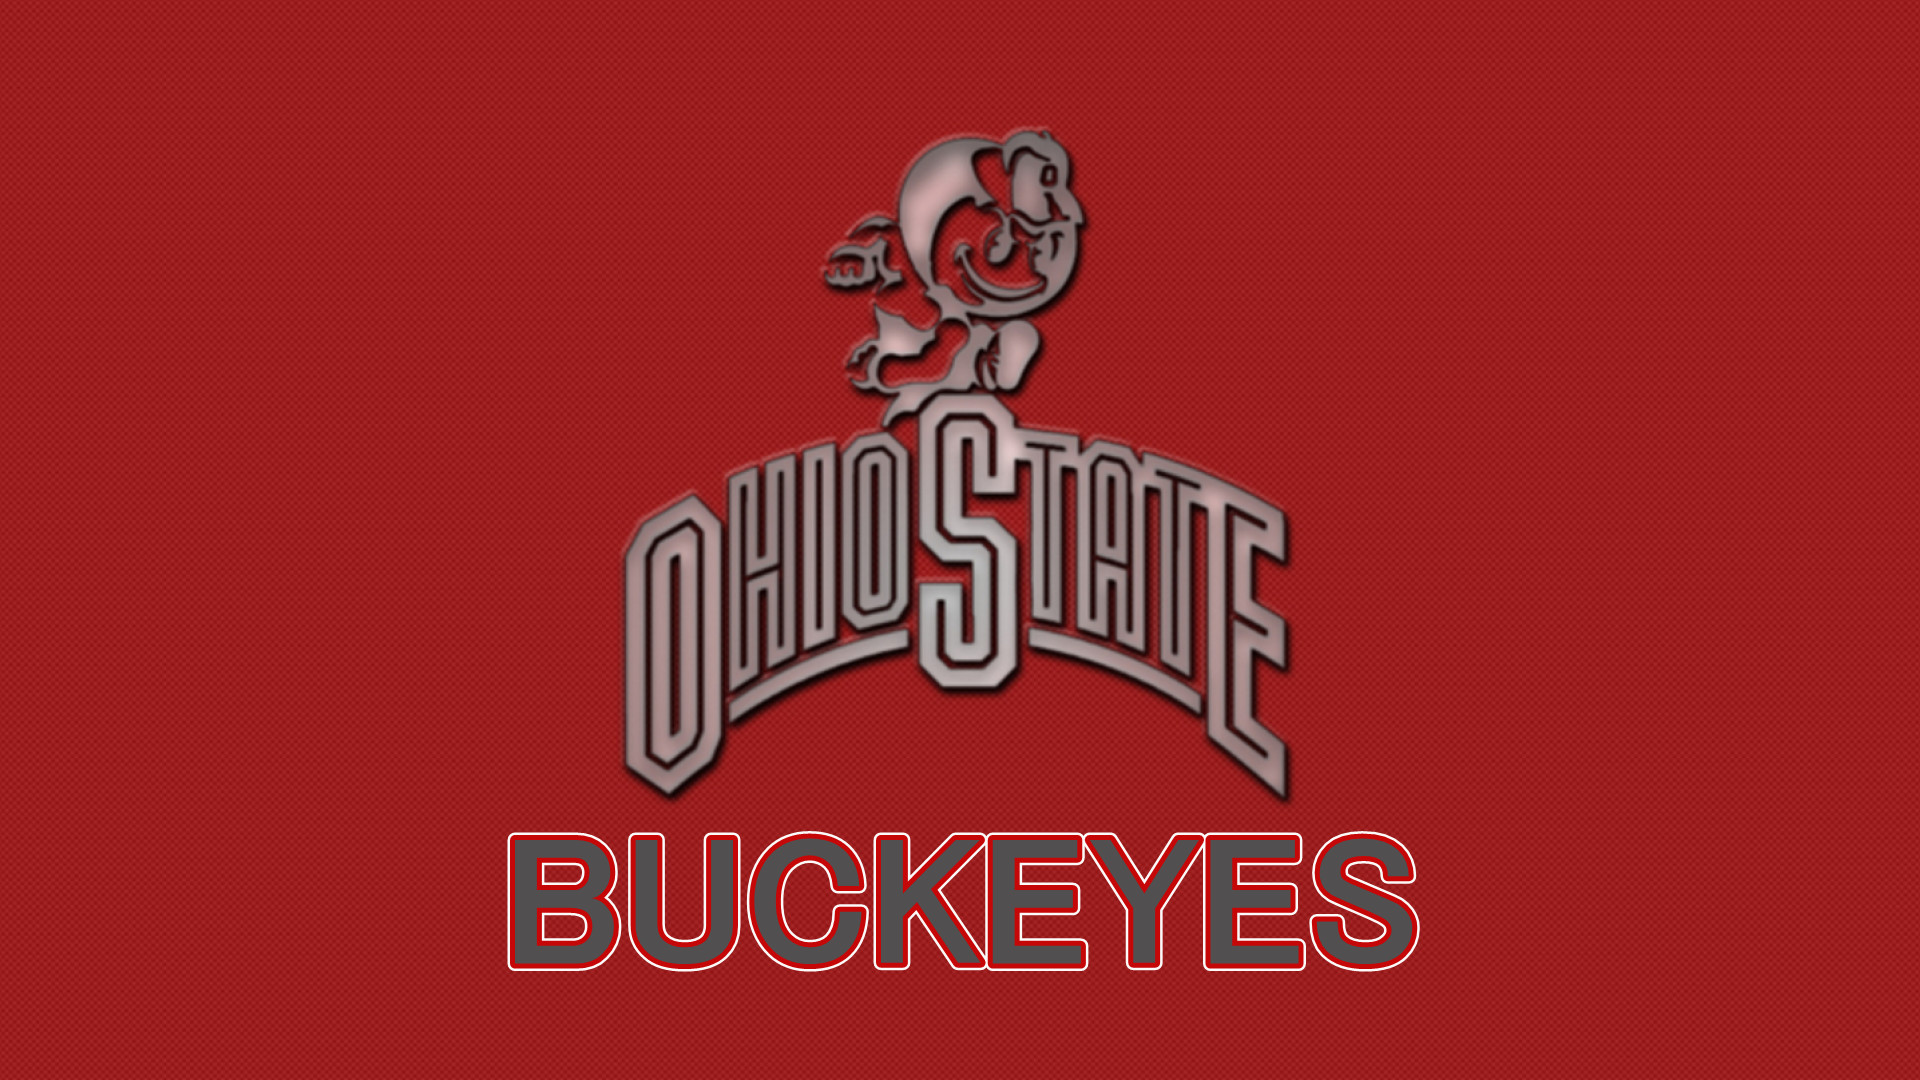 Ohio State Buckeyes 896633 …